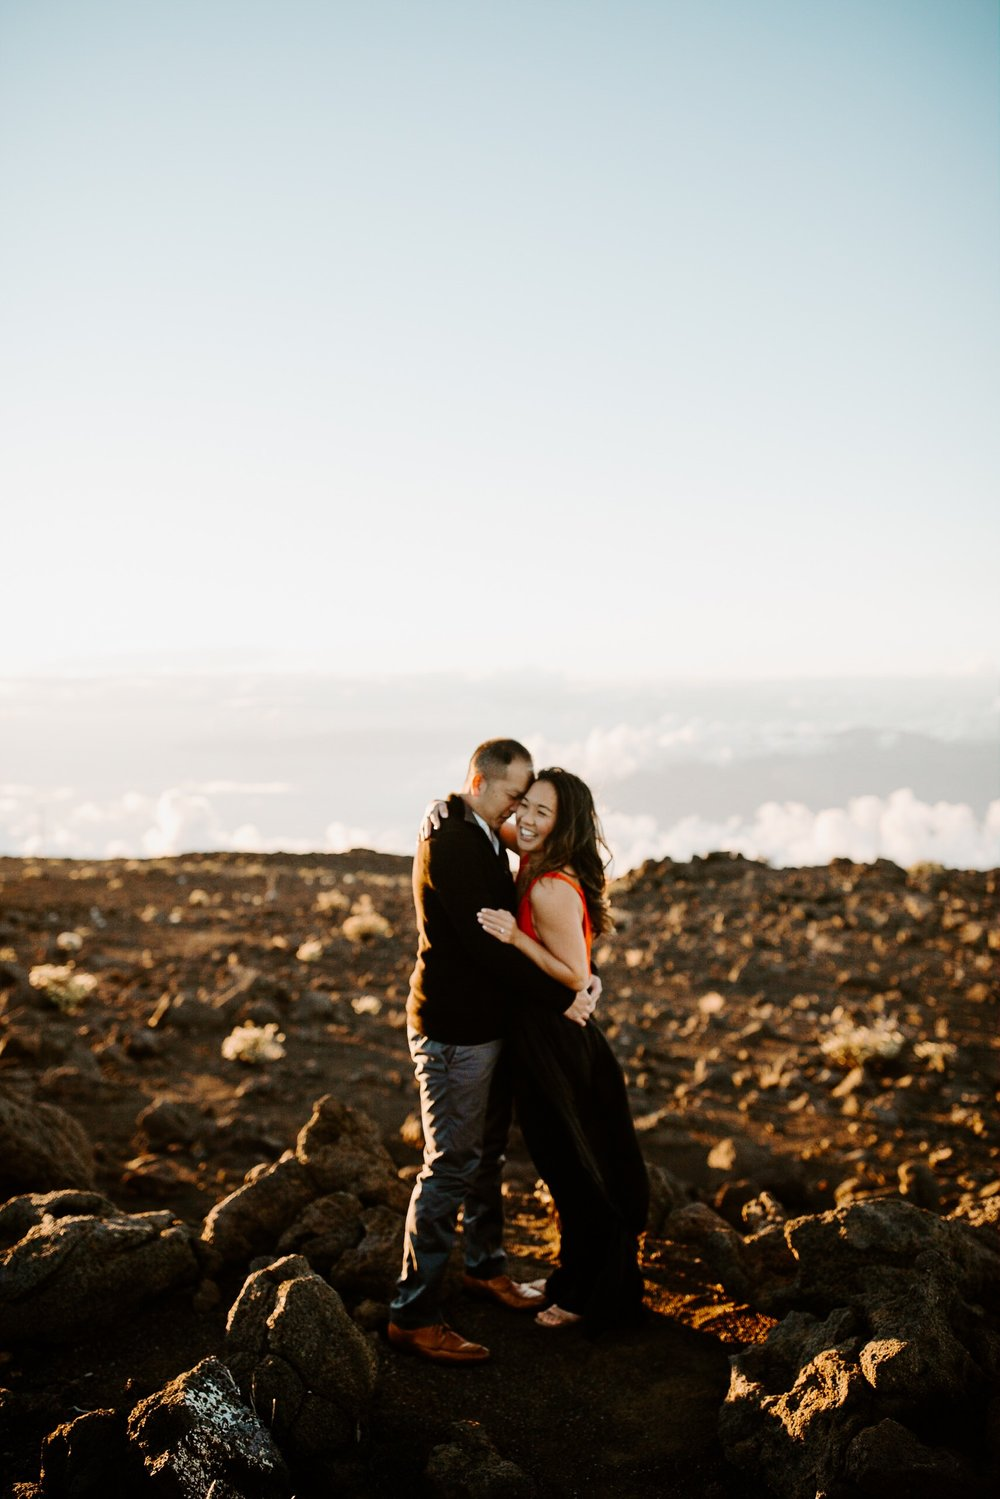 24_Haleakala National Park Maui Engagement Session Krystal & Allan | Emily Magers Photography-143.jpg